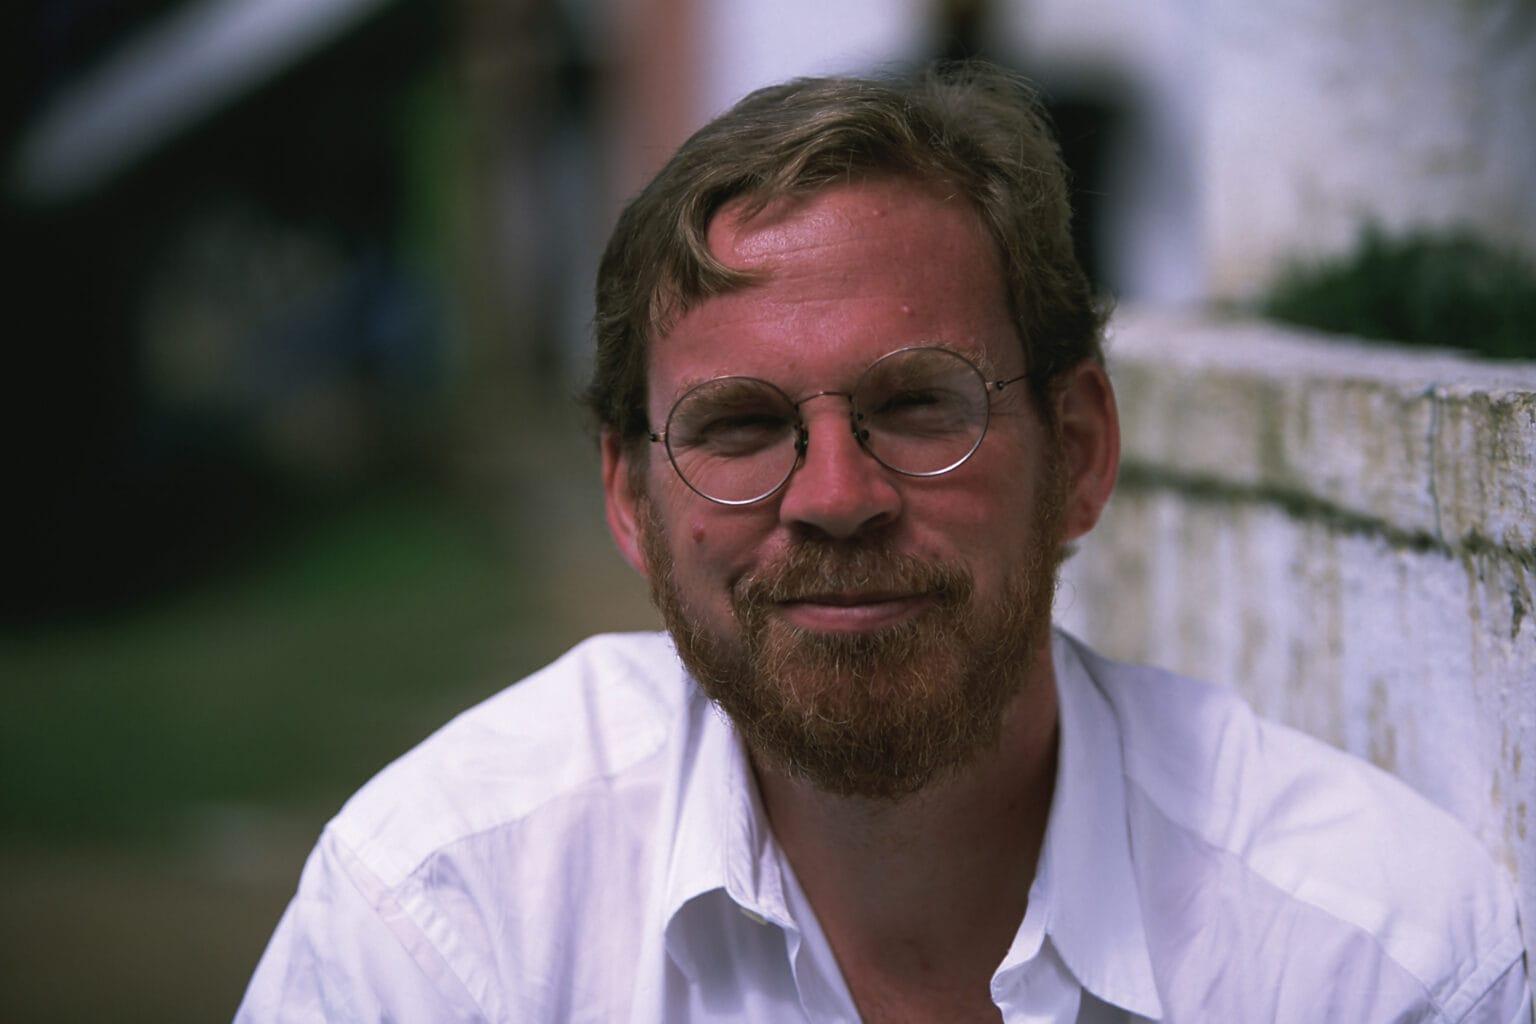 Mike Hawley